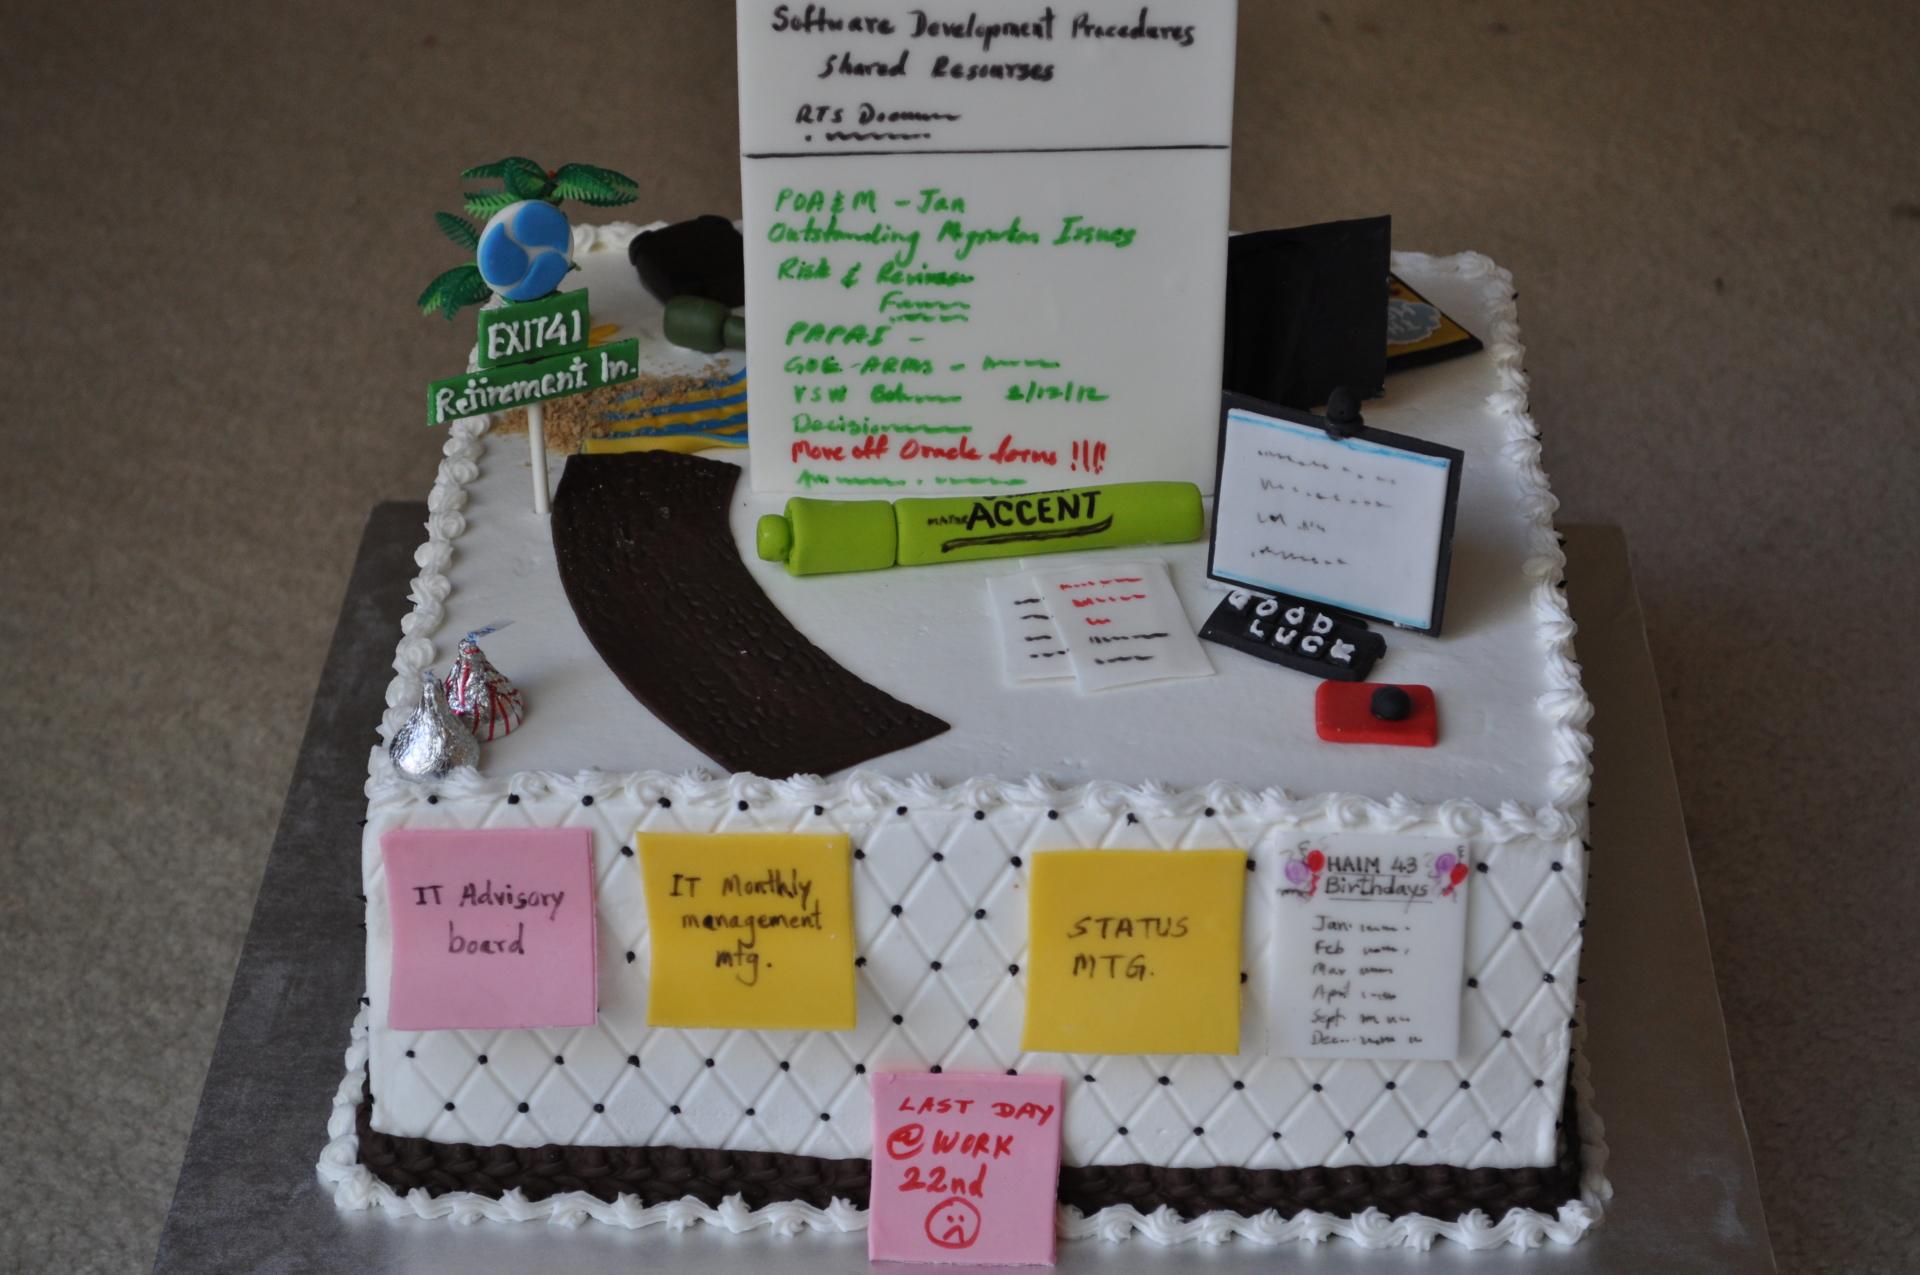 Personalized retirement cake